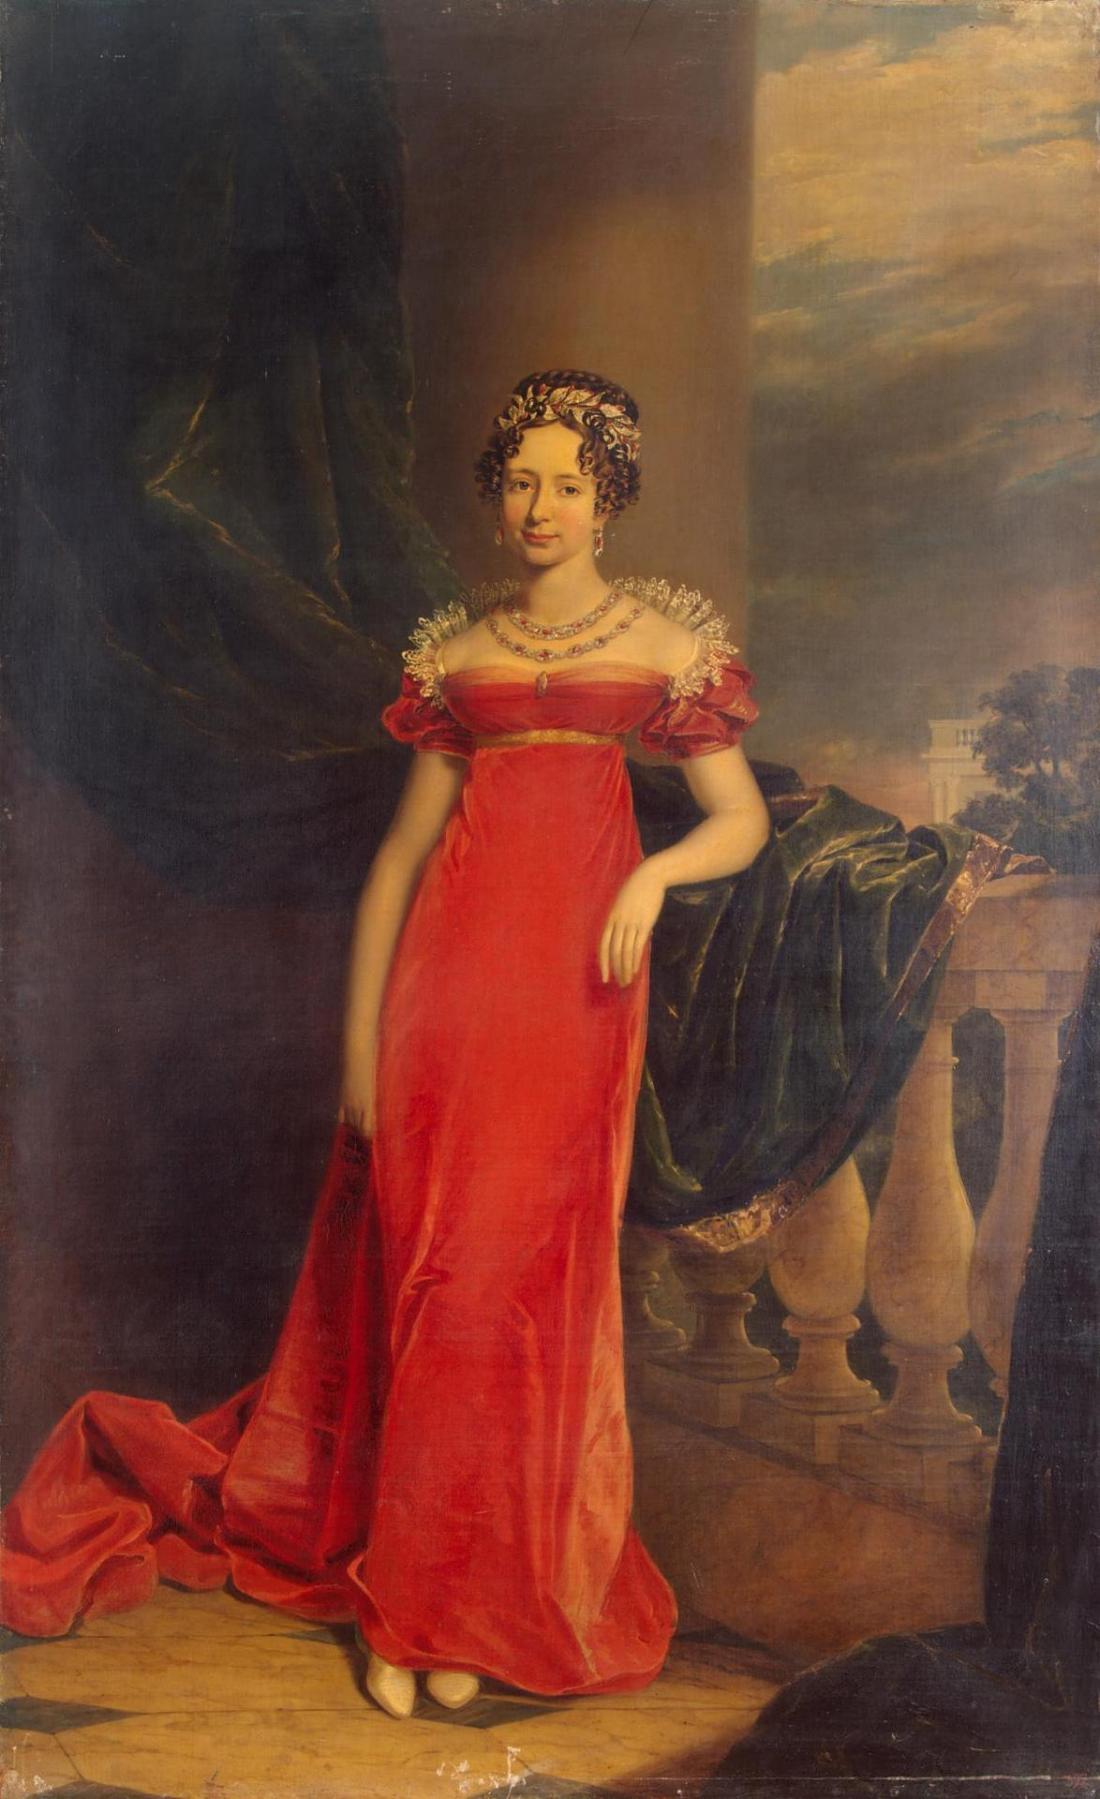 Grand Duchess Maria Pavlovna of Russia. 1822.